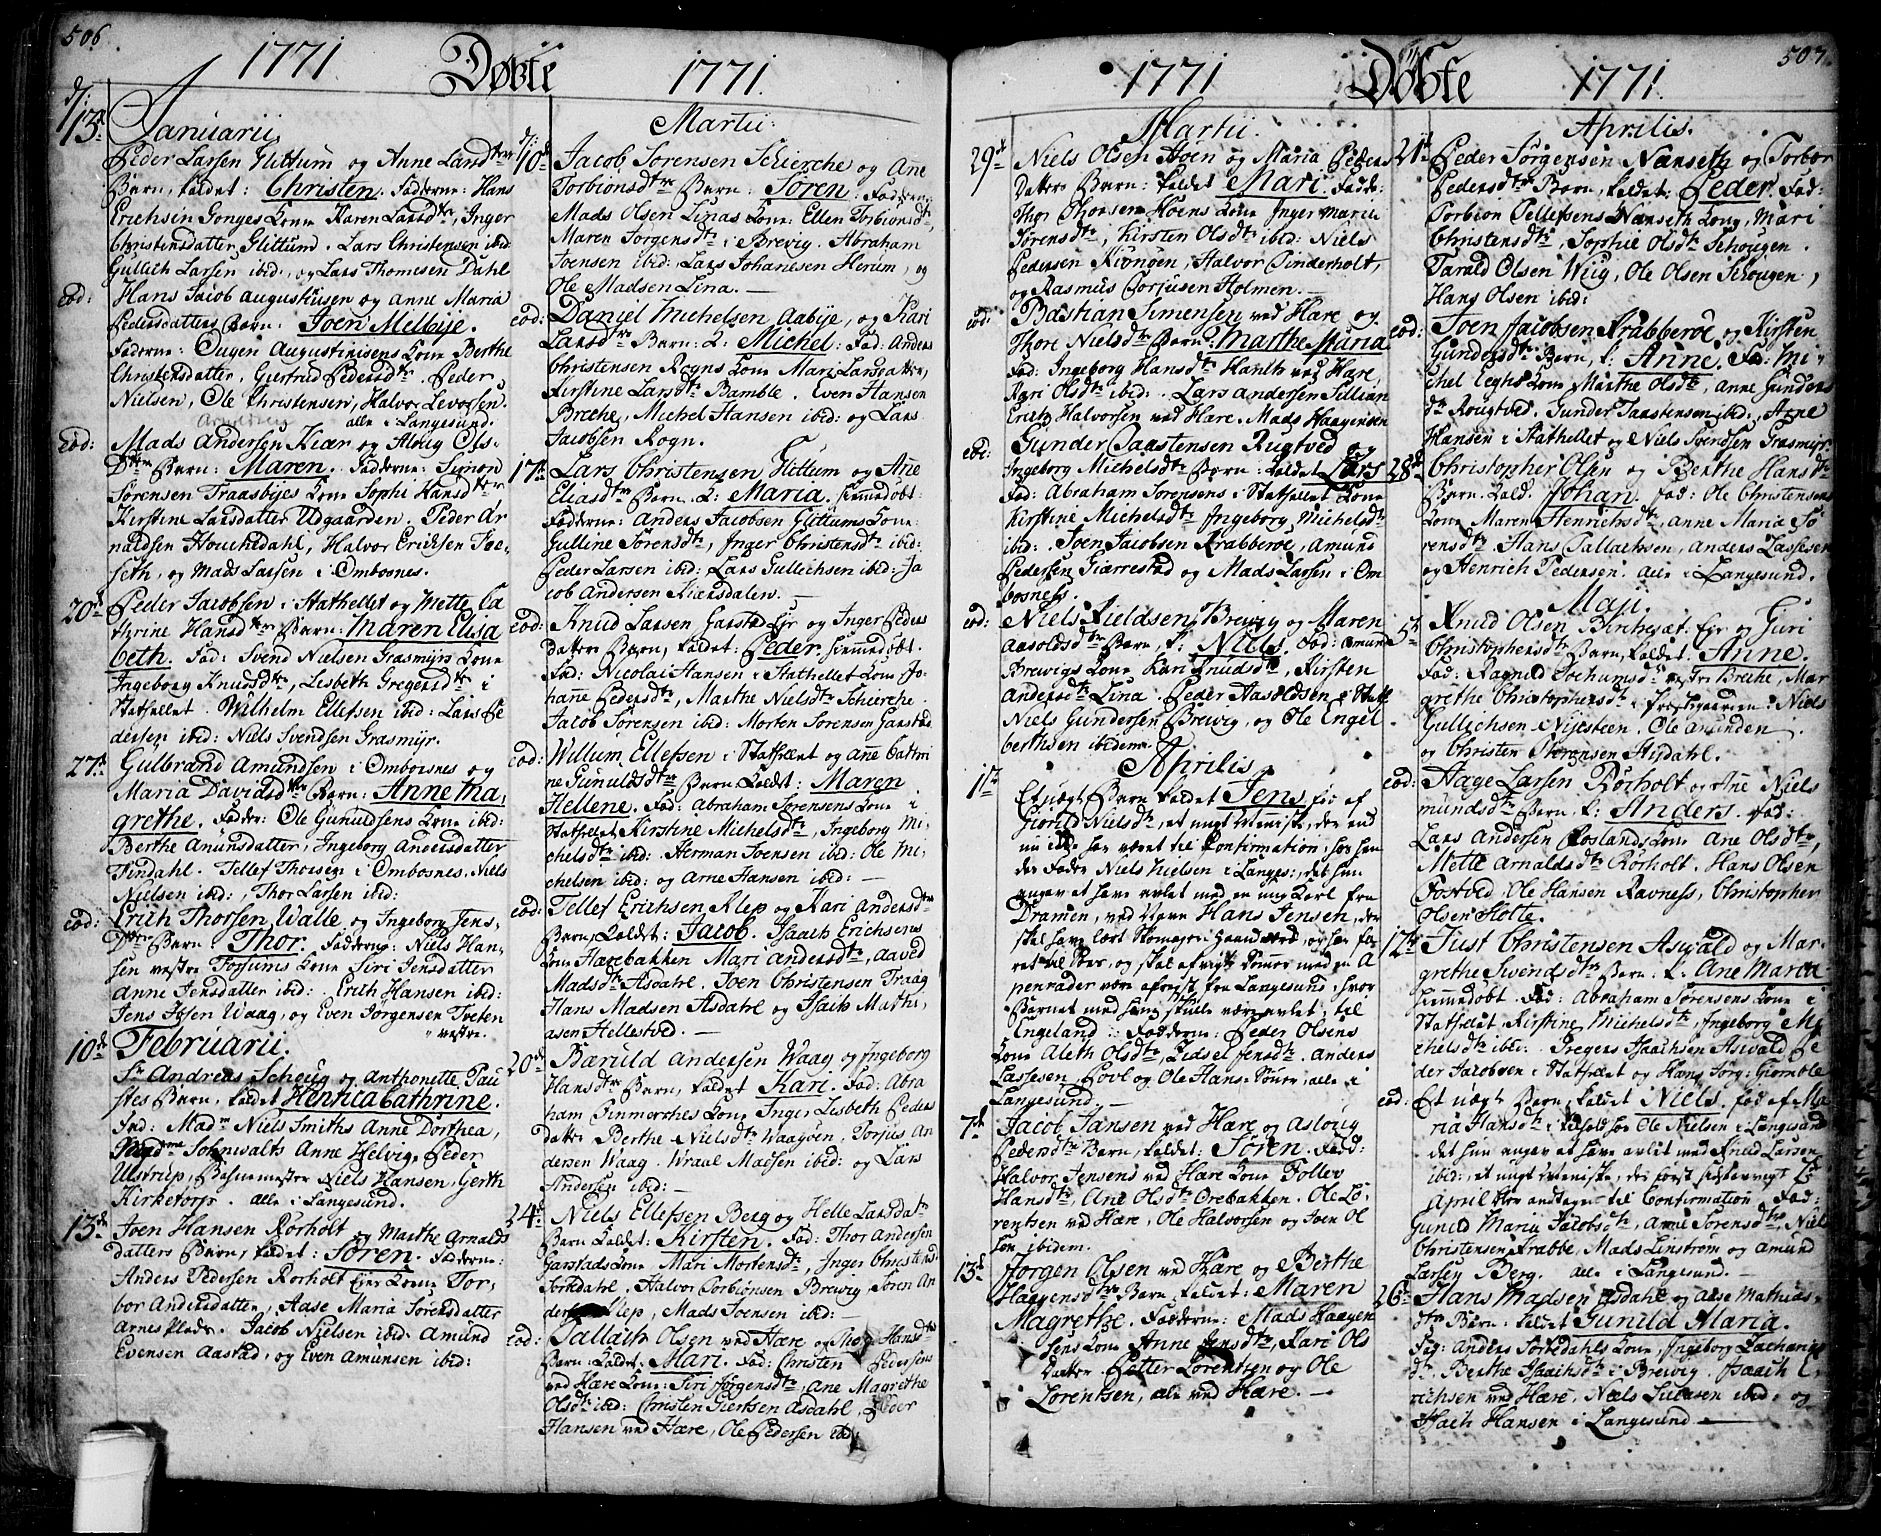 SAKO, Bamble kirkebøker, F/Fa/L0001: Ministerialbok nr. I 1, 1702-1774, s. 506-507